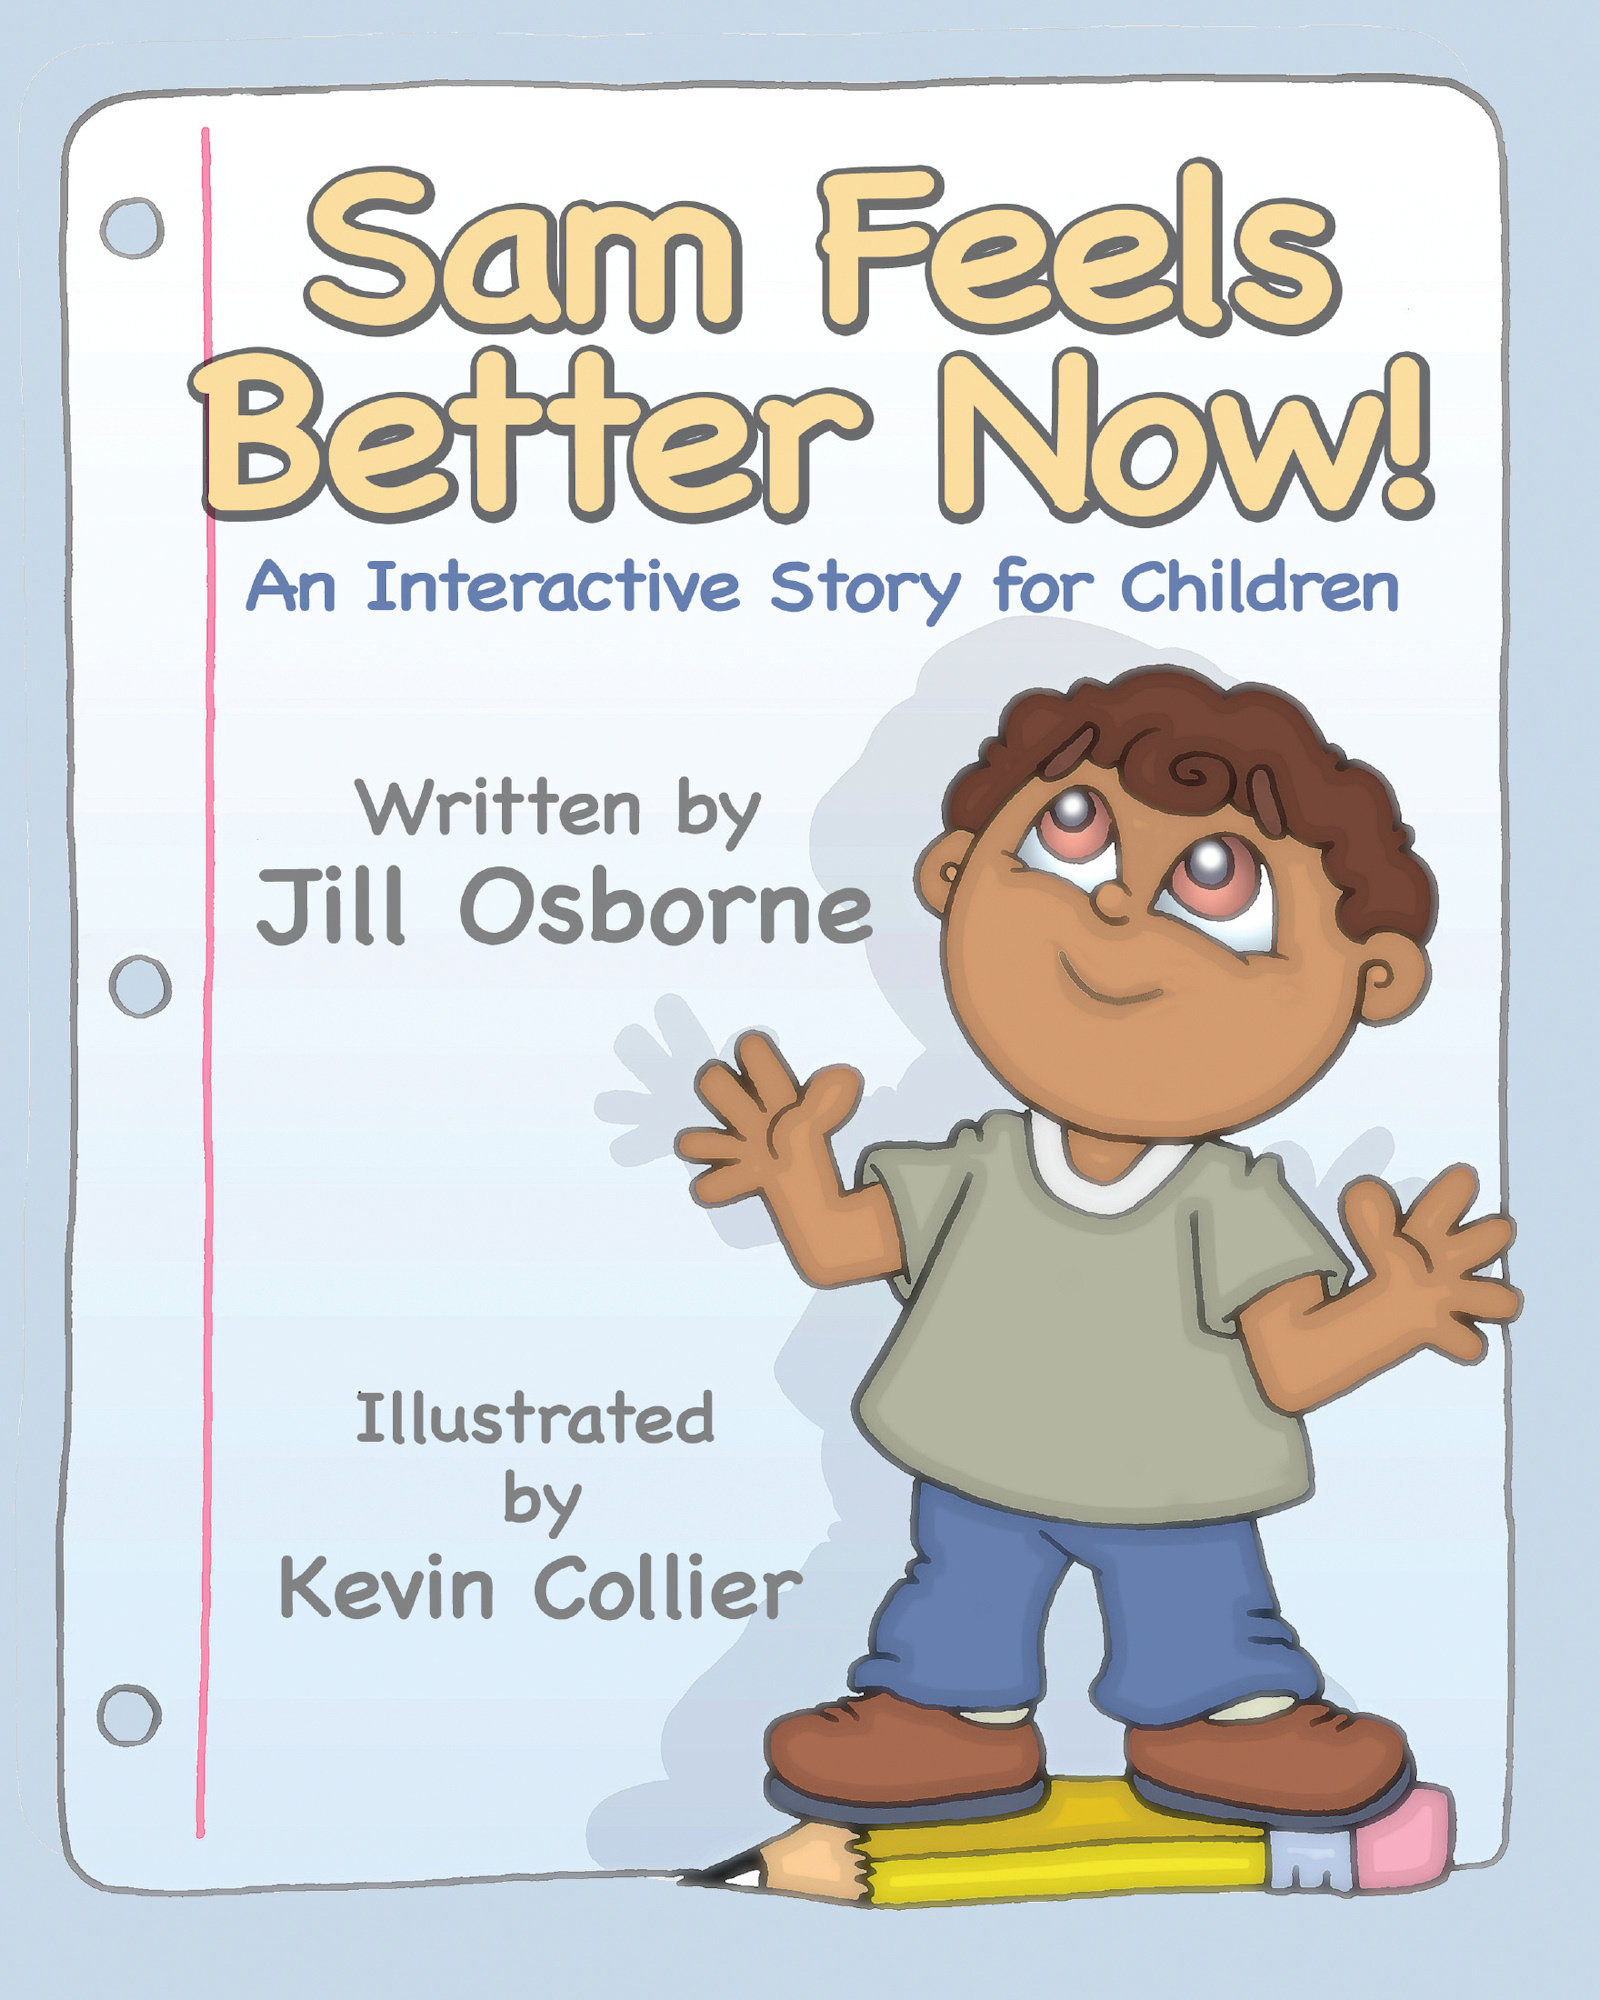 Sam Feels Better Now!: An Interactive Story For Children 978-1-932690-60-6